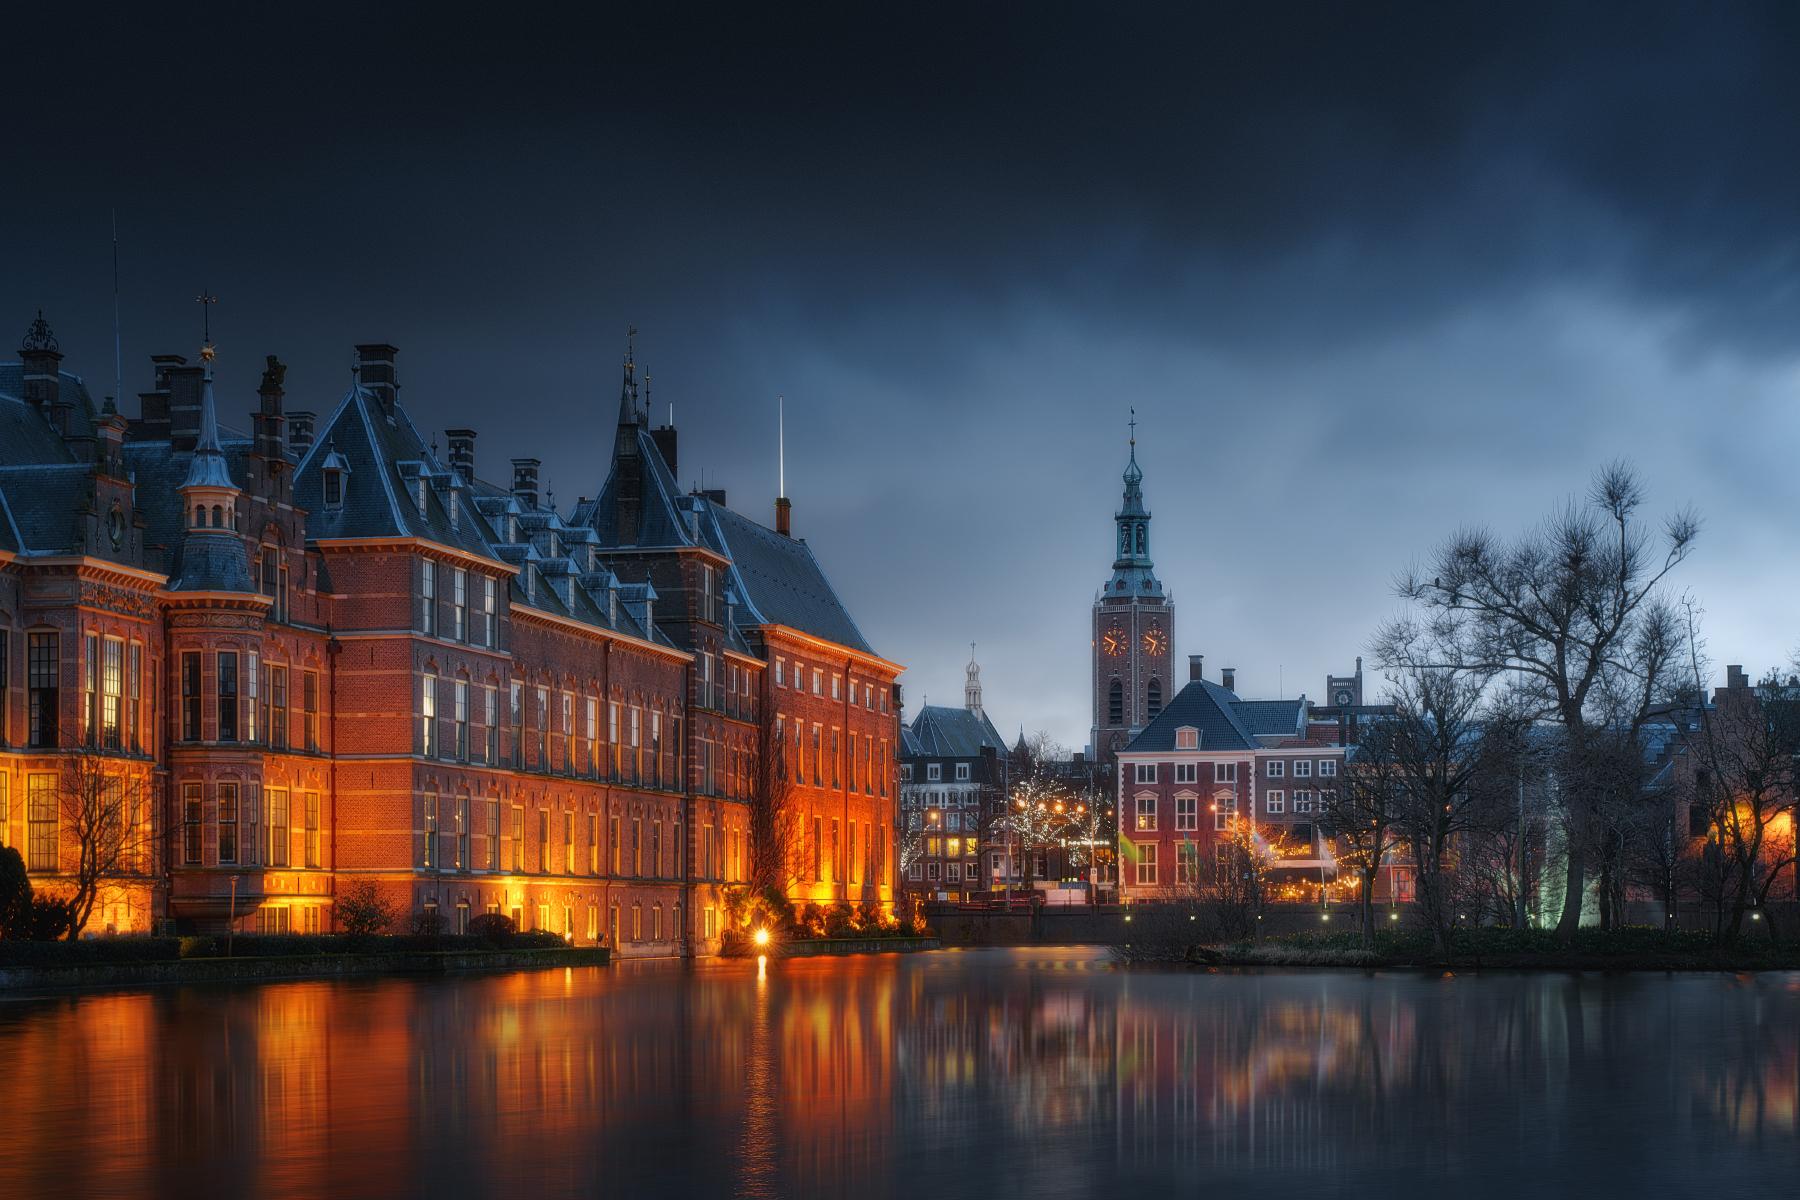 General 1800x1200 winter water city cityscape night lights reflection building trees overcast photography Amsterdam Ivan Kurmyshov